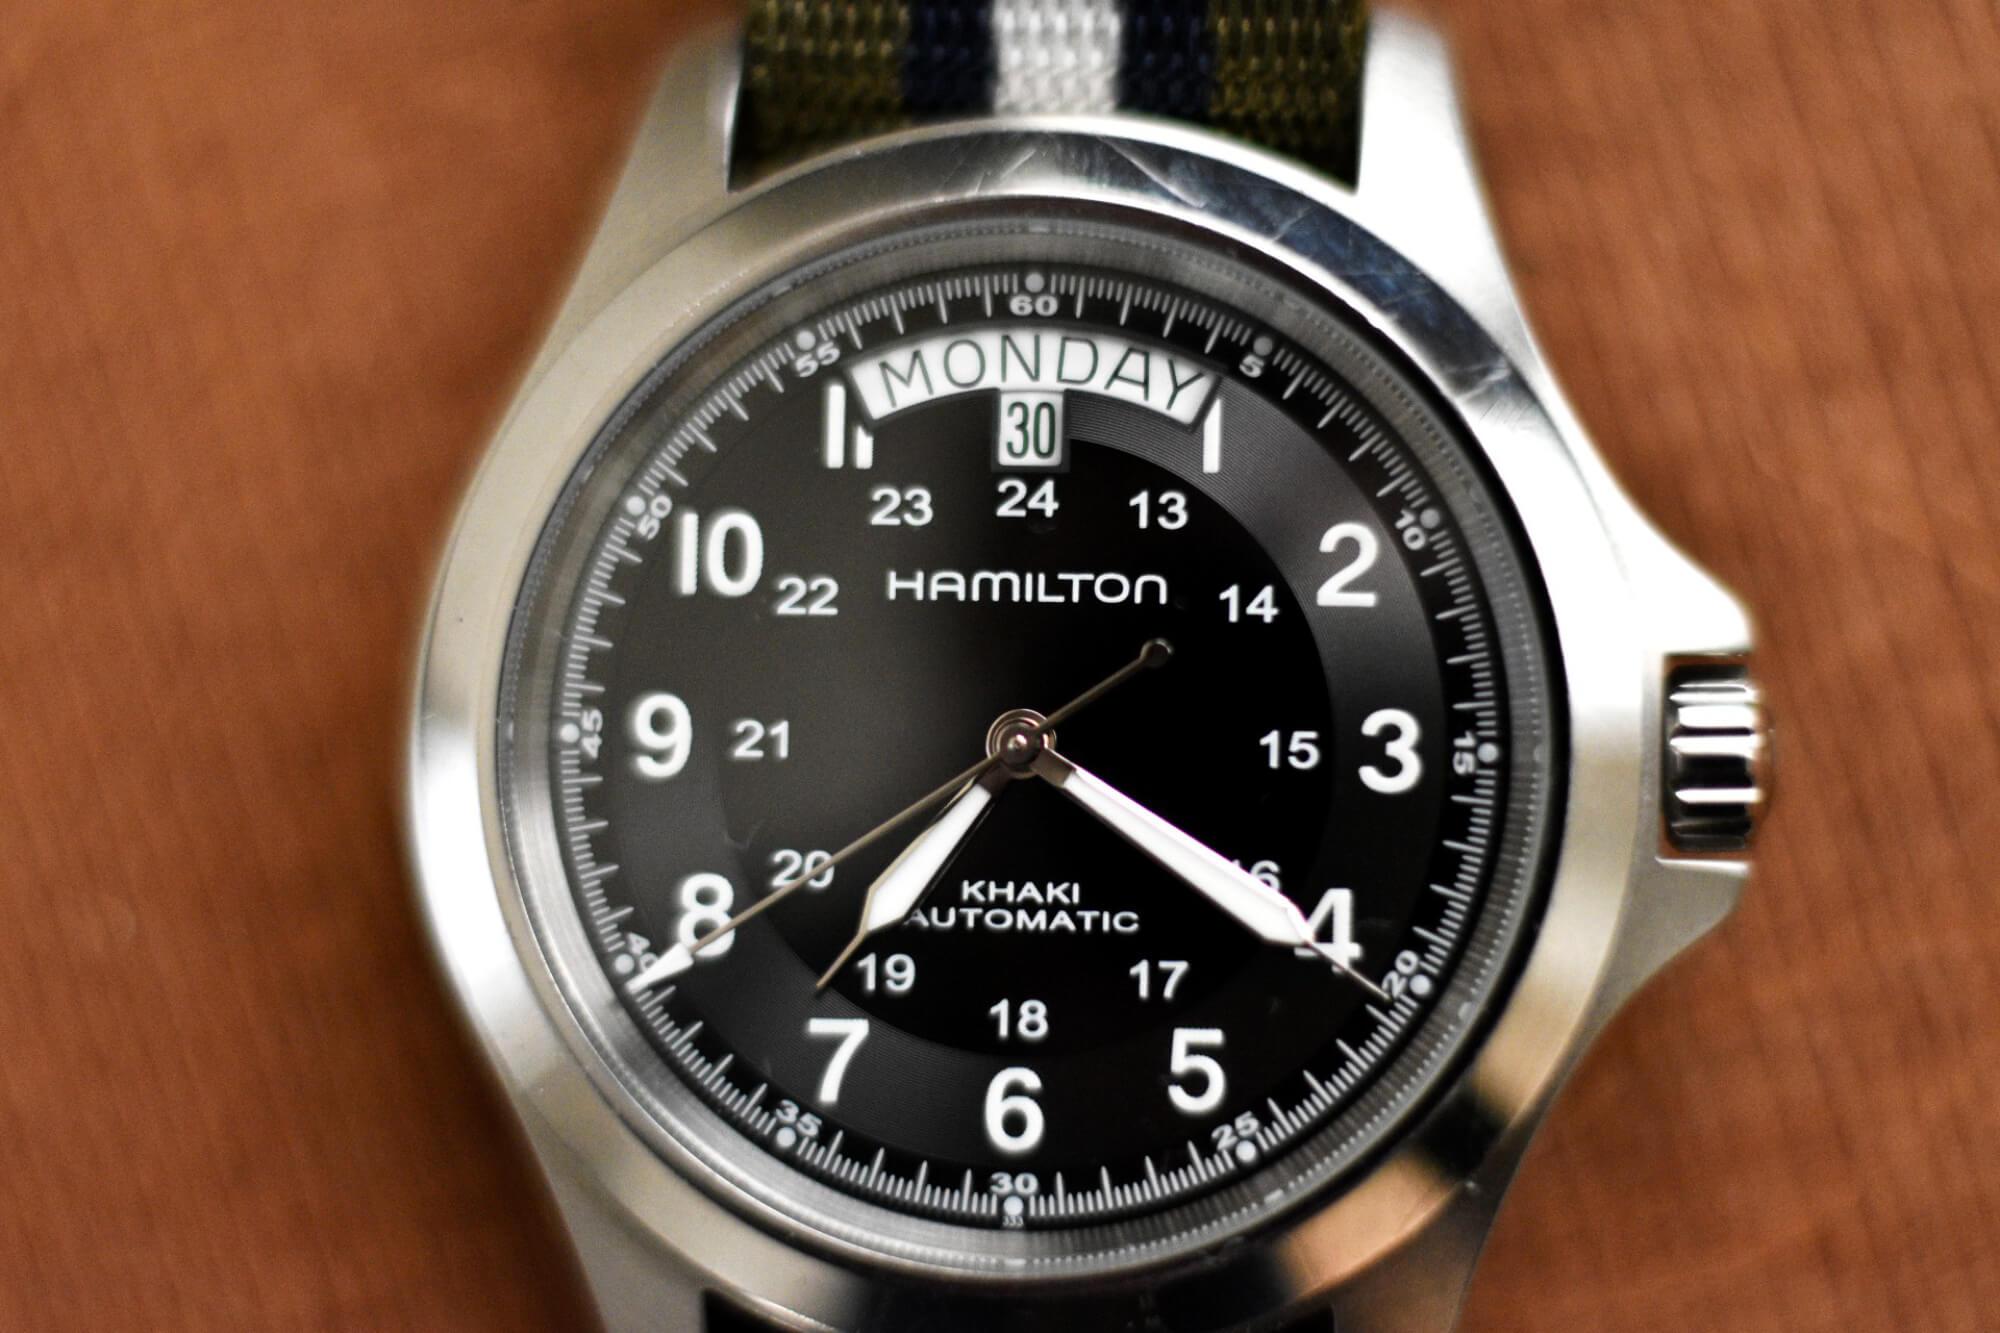 Khaki-King-Closeup-field-watch